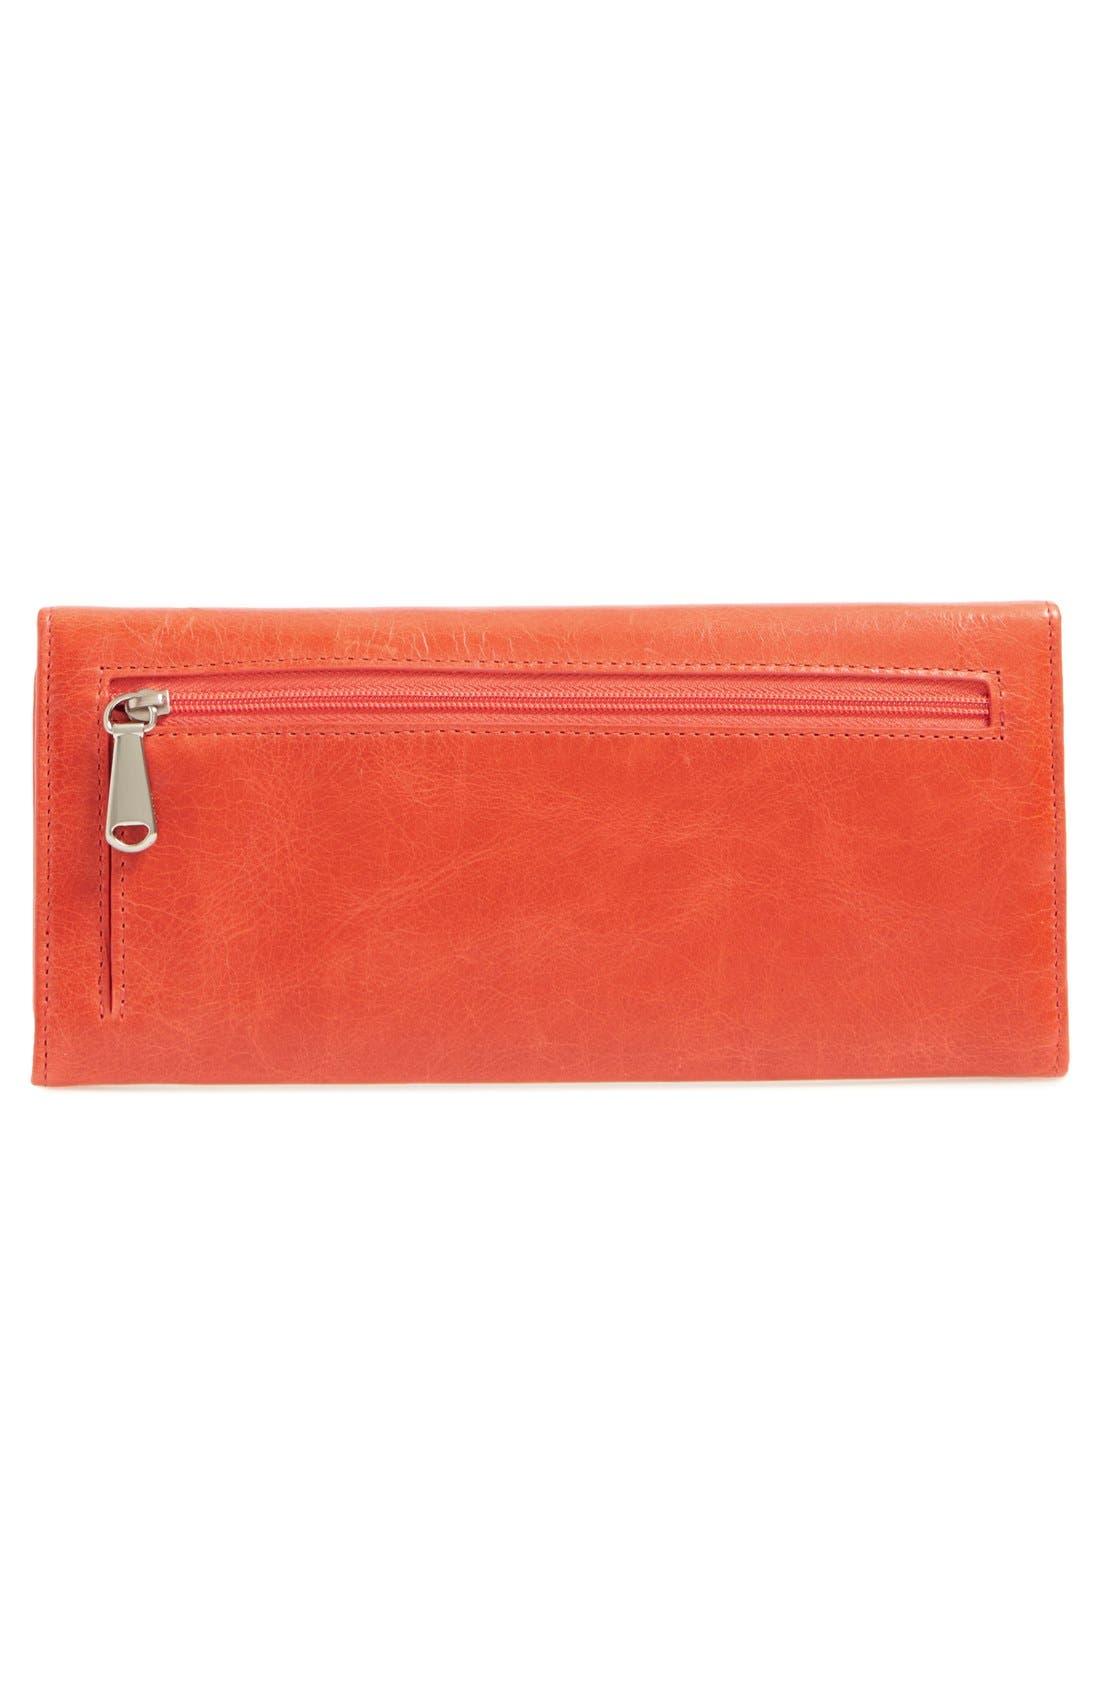 'Sadie' Leather Wallet,                             Alternate thumbnail 131, color,